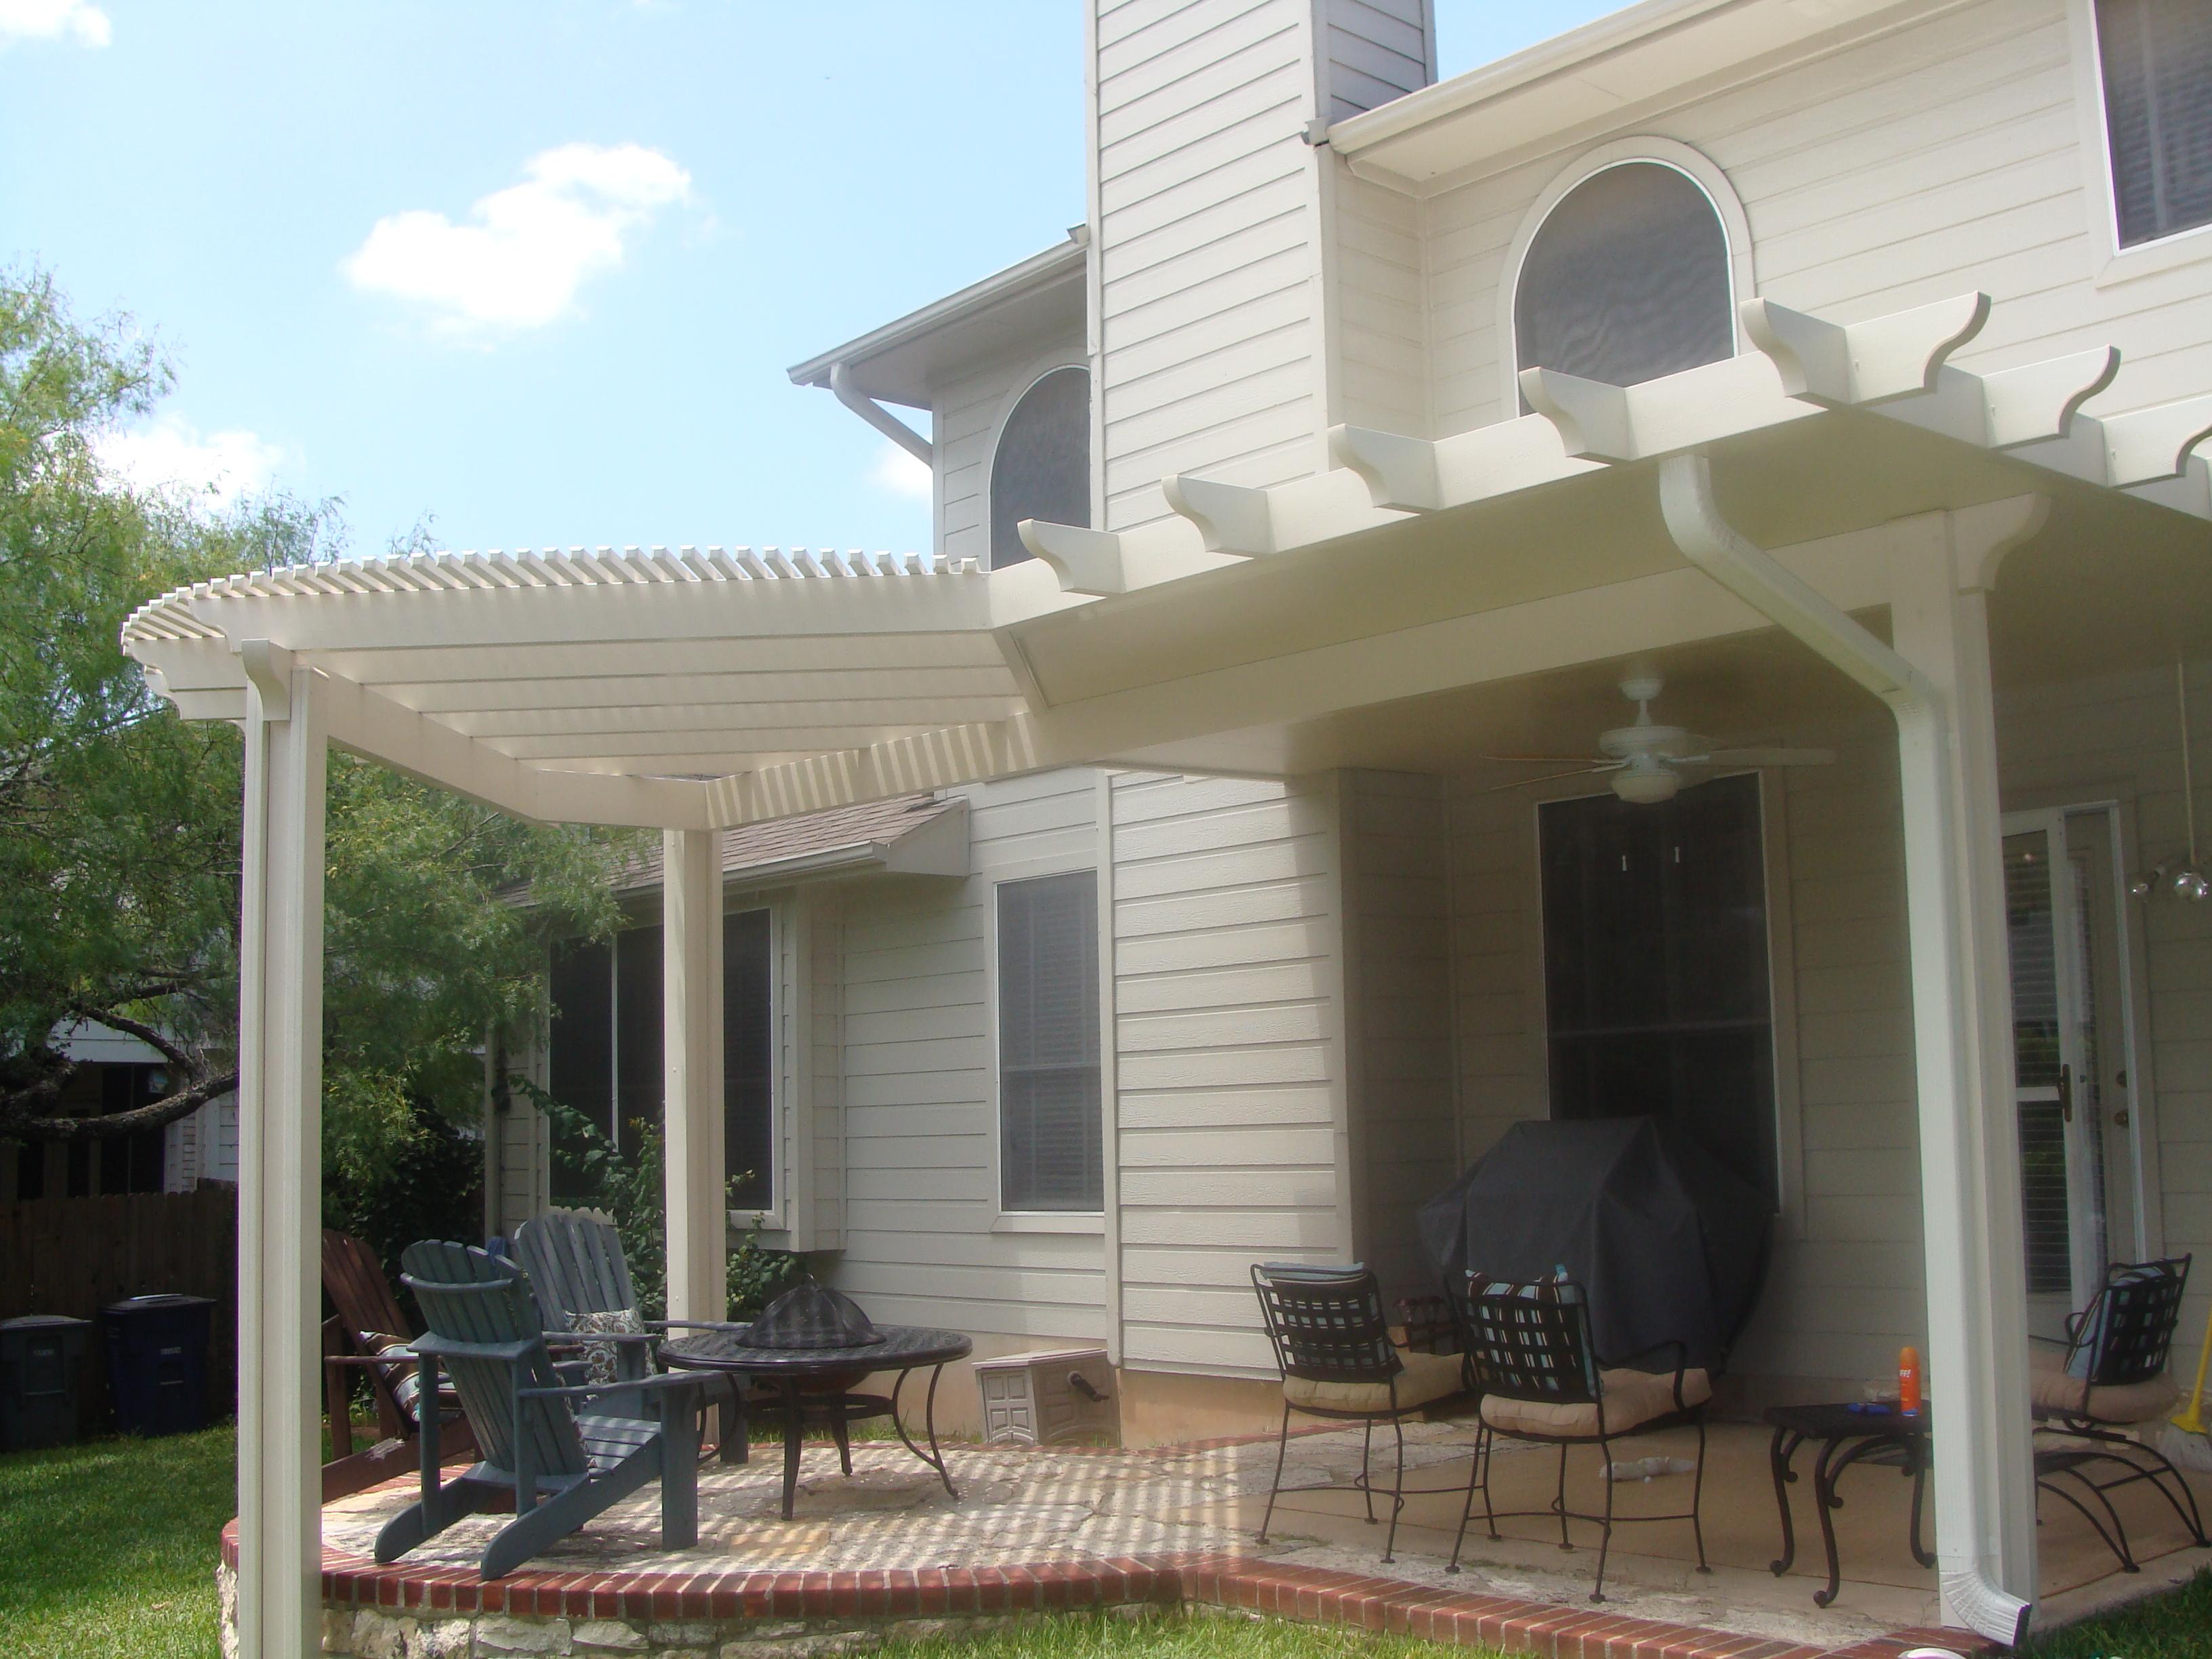 Patios U0026 Pergolas   College Station, TX: Lone Star Patio U0026 Outdoor Living,  LLC